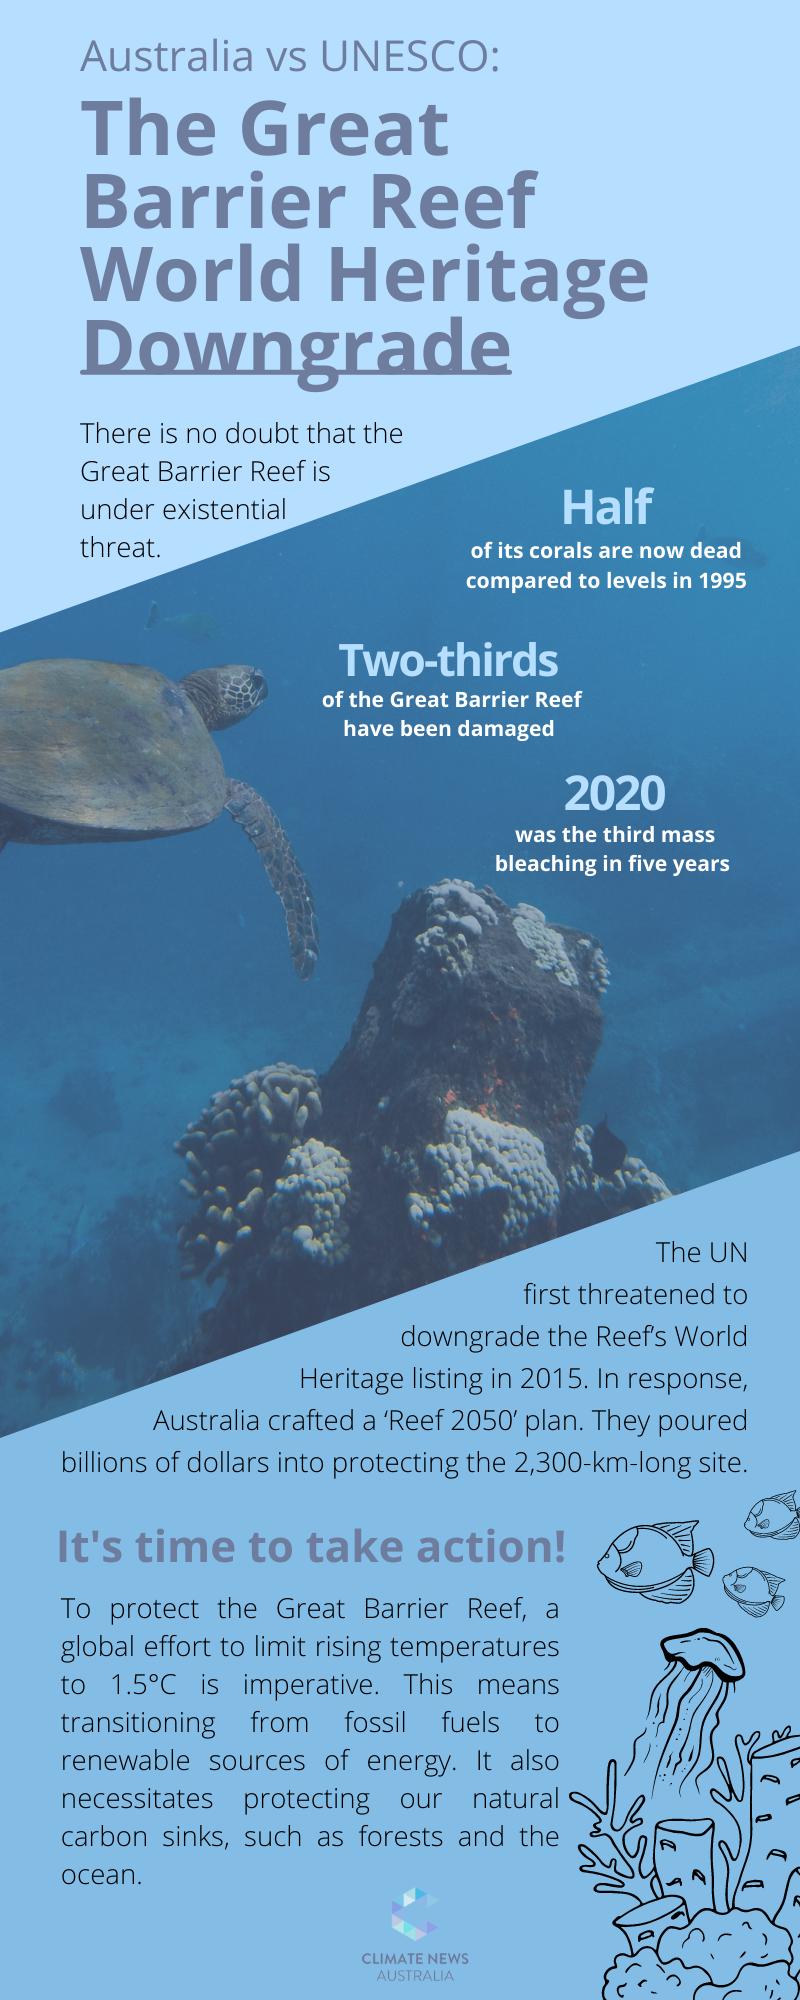 Australia vs UNESCO - The Great Barrier Reef World Heritage Downgrade